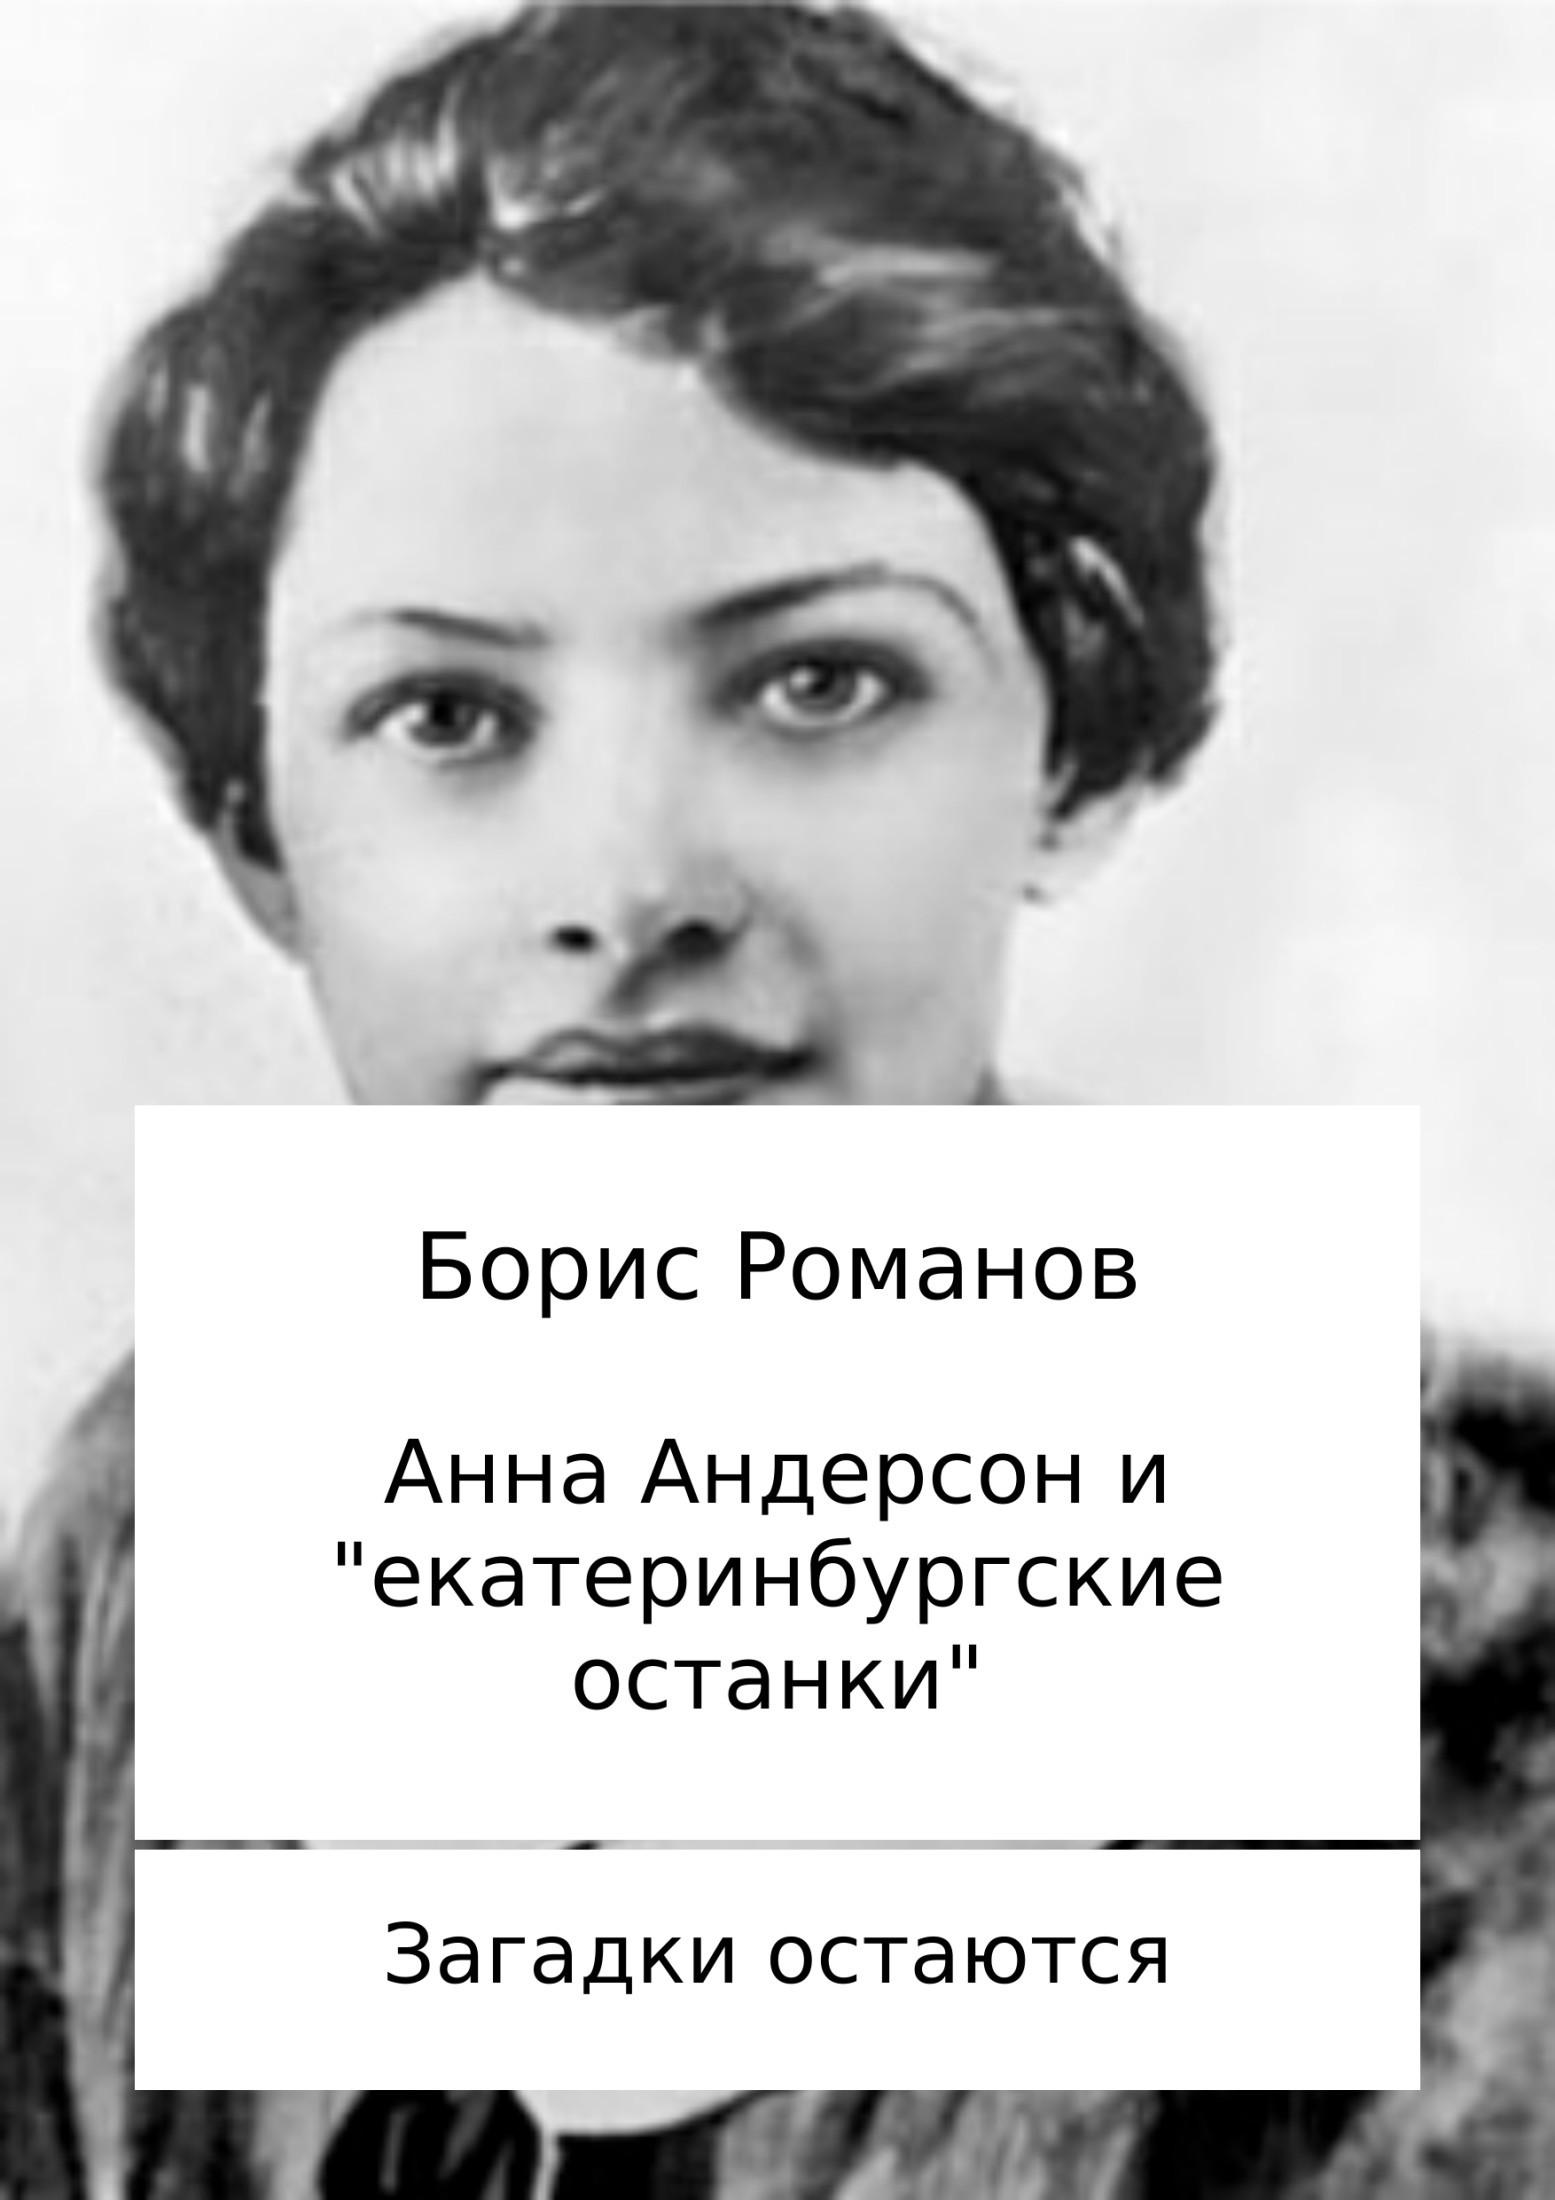 Борис Романов бесплатно